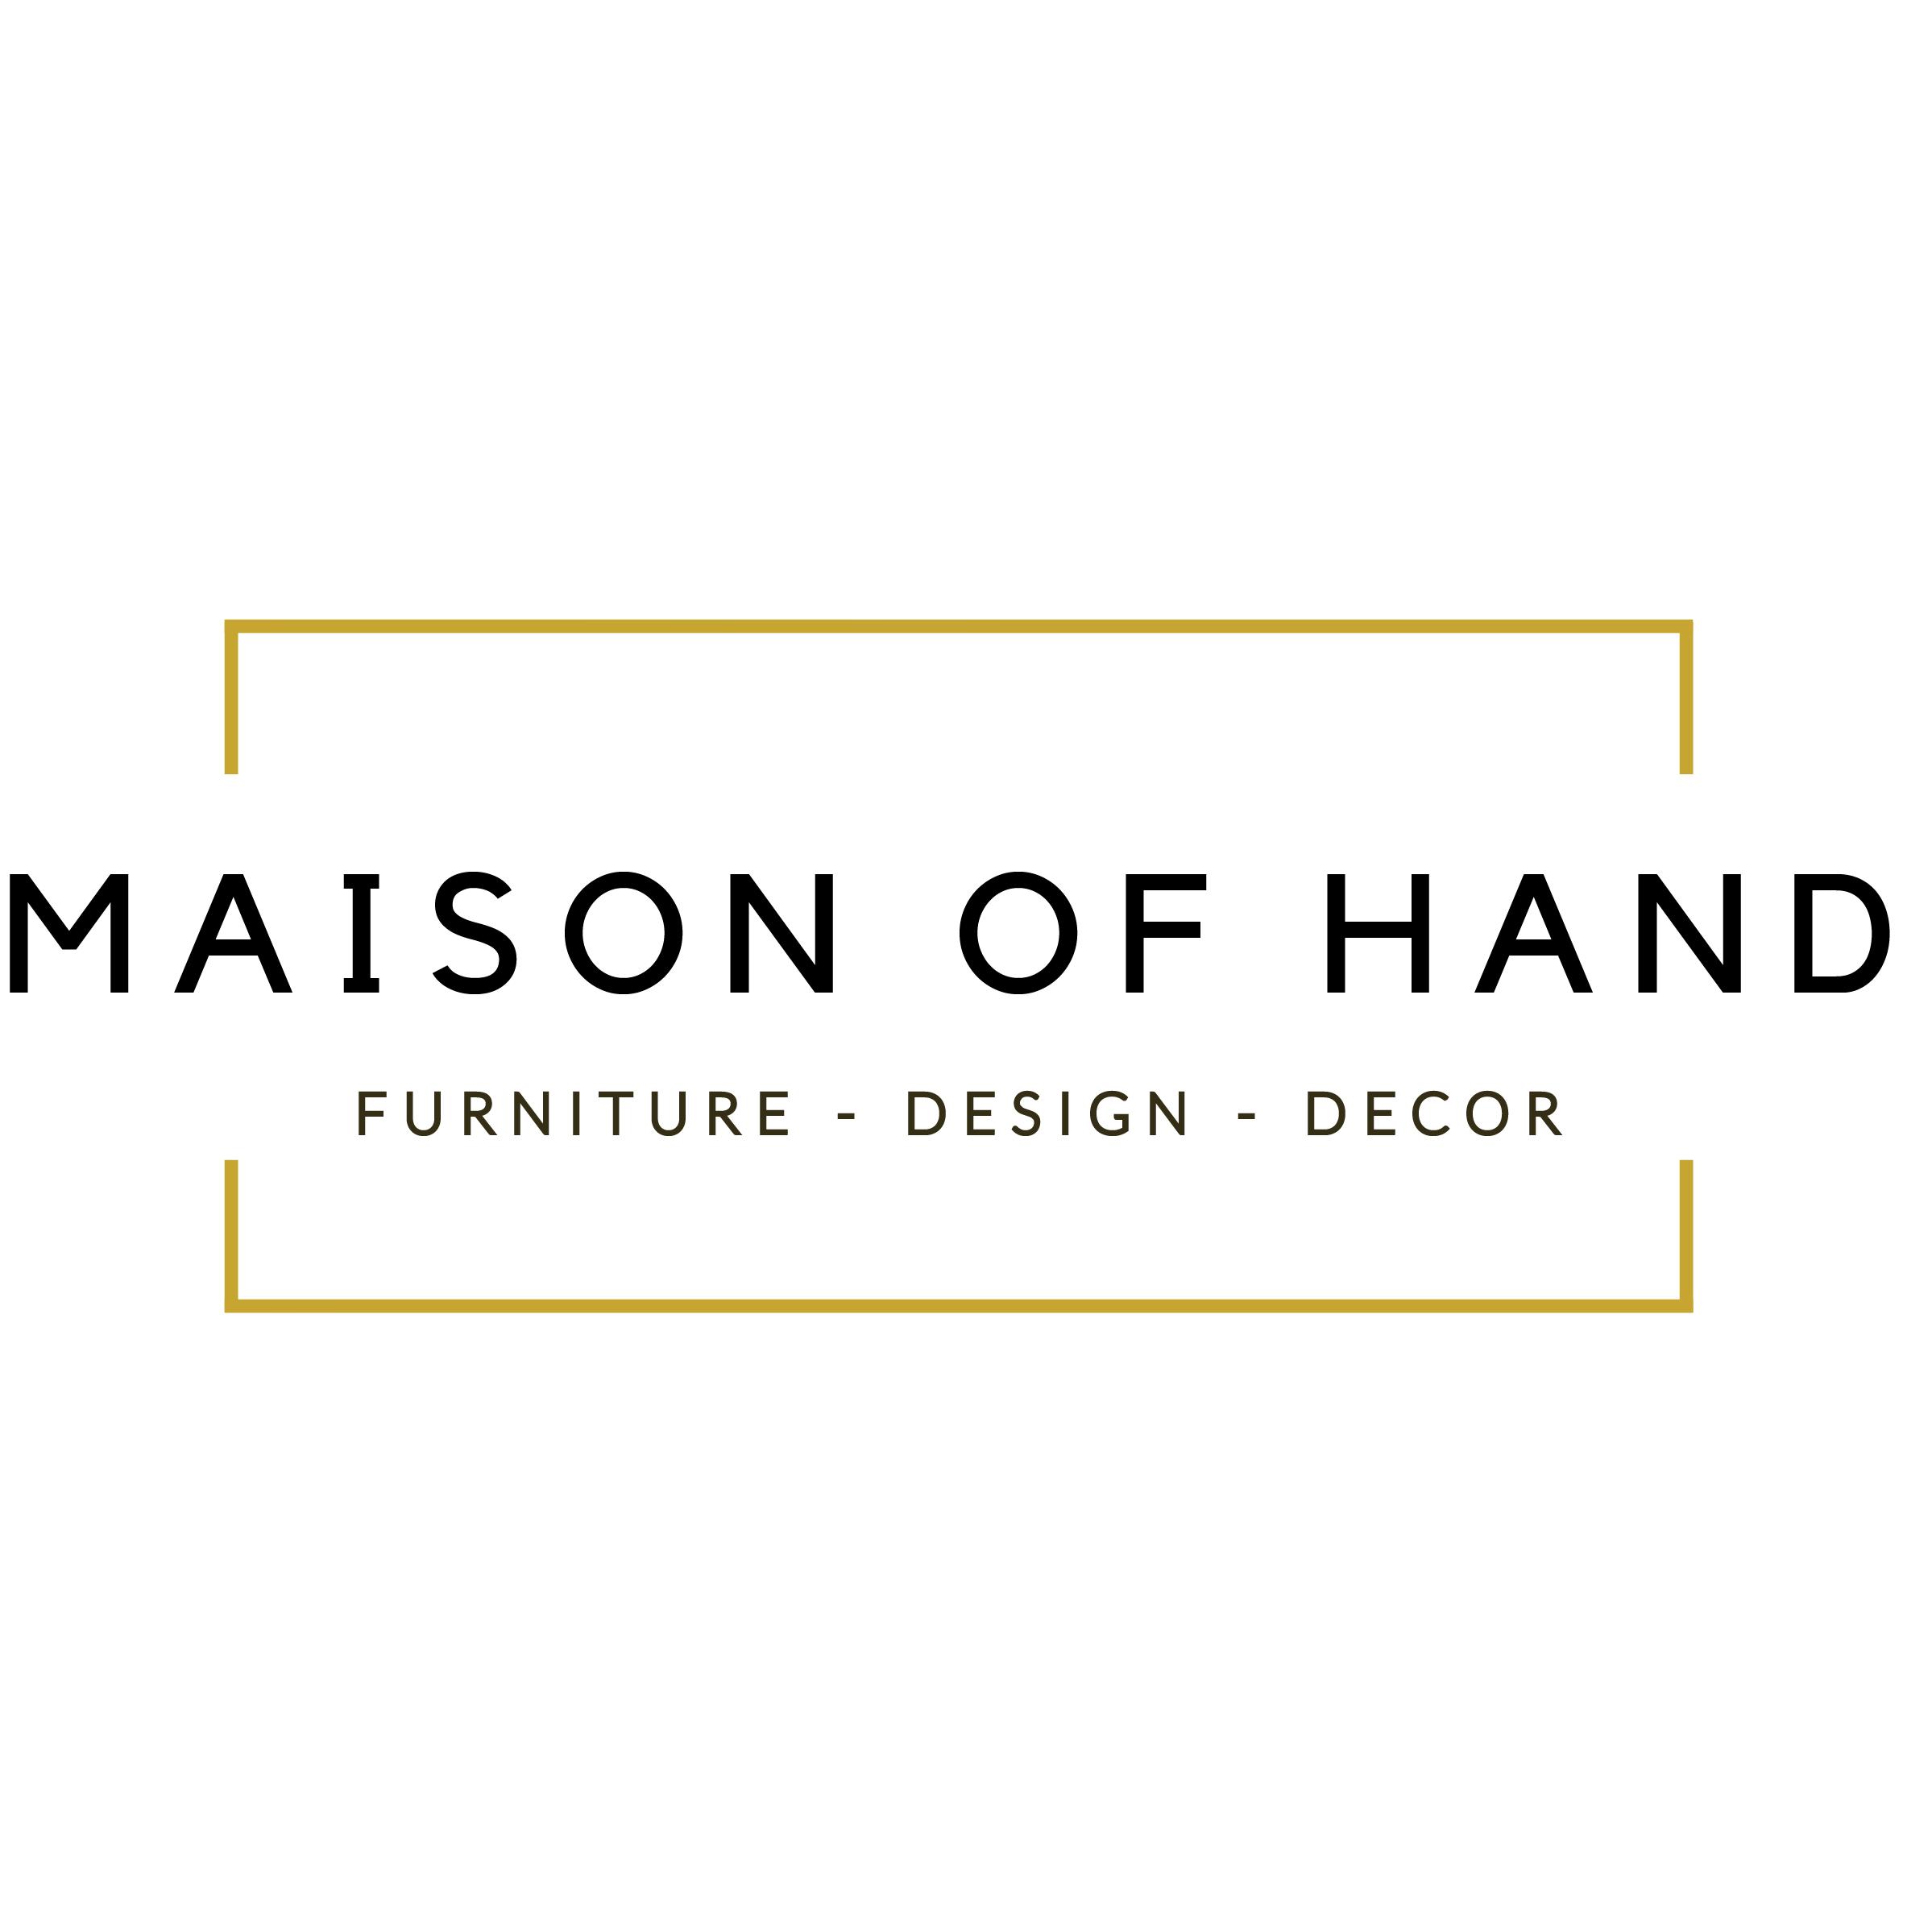 Maison of Hand